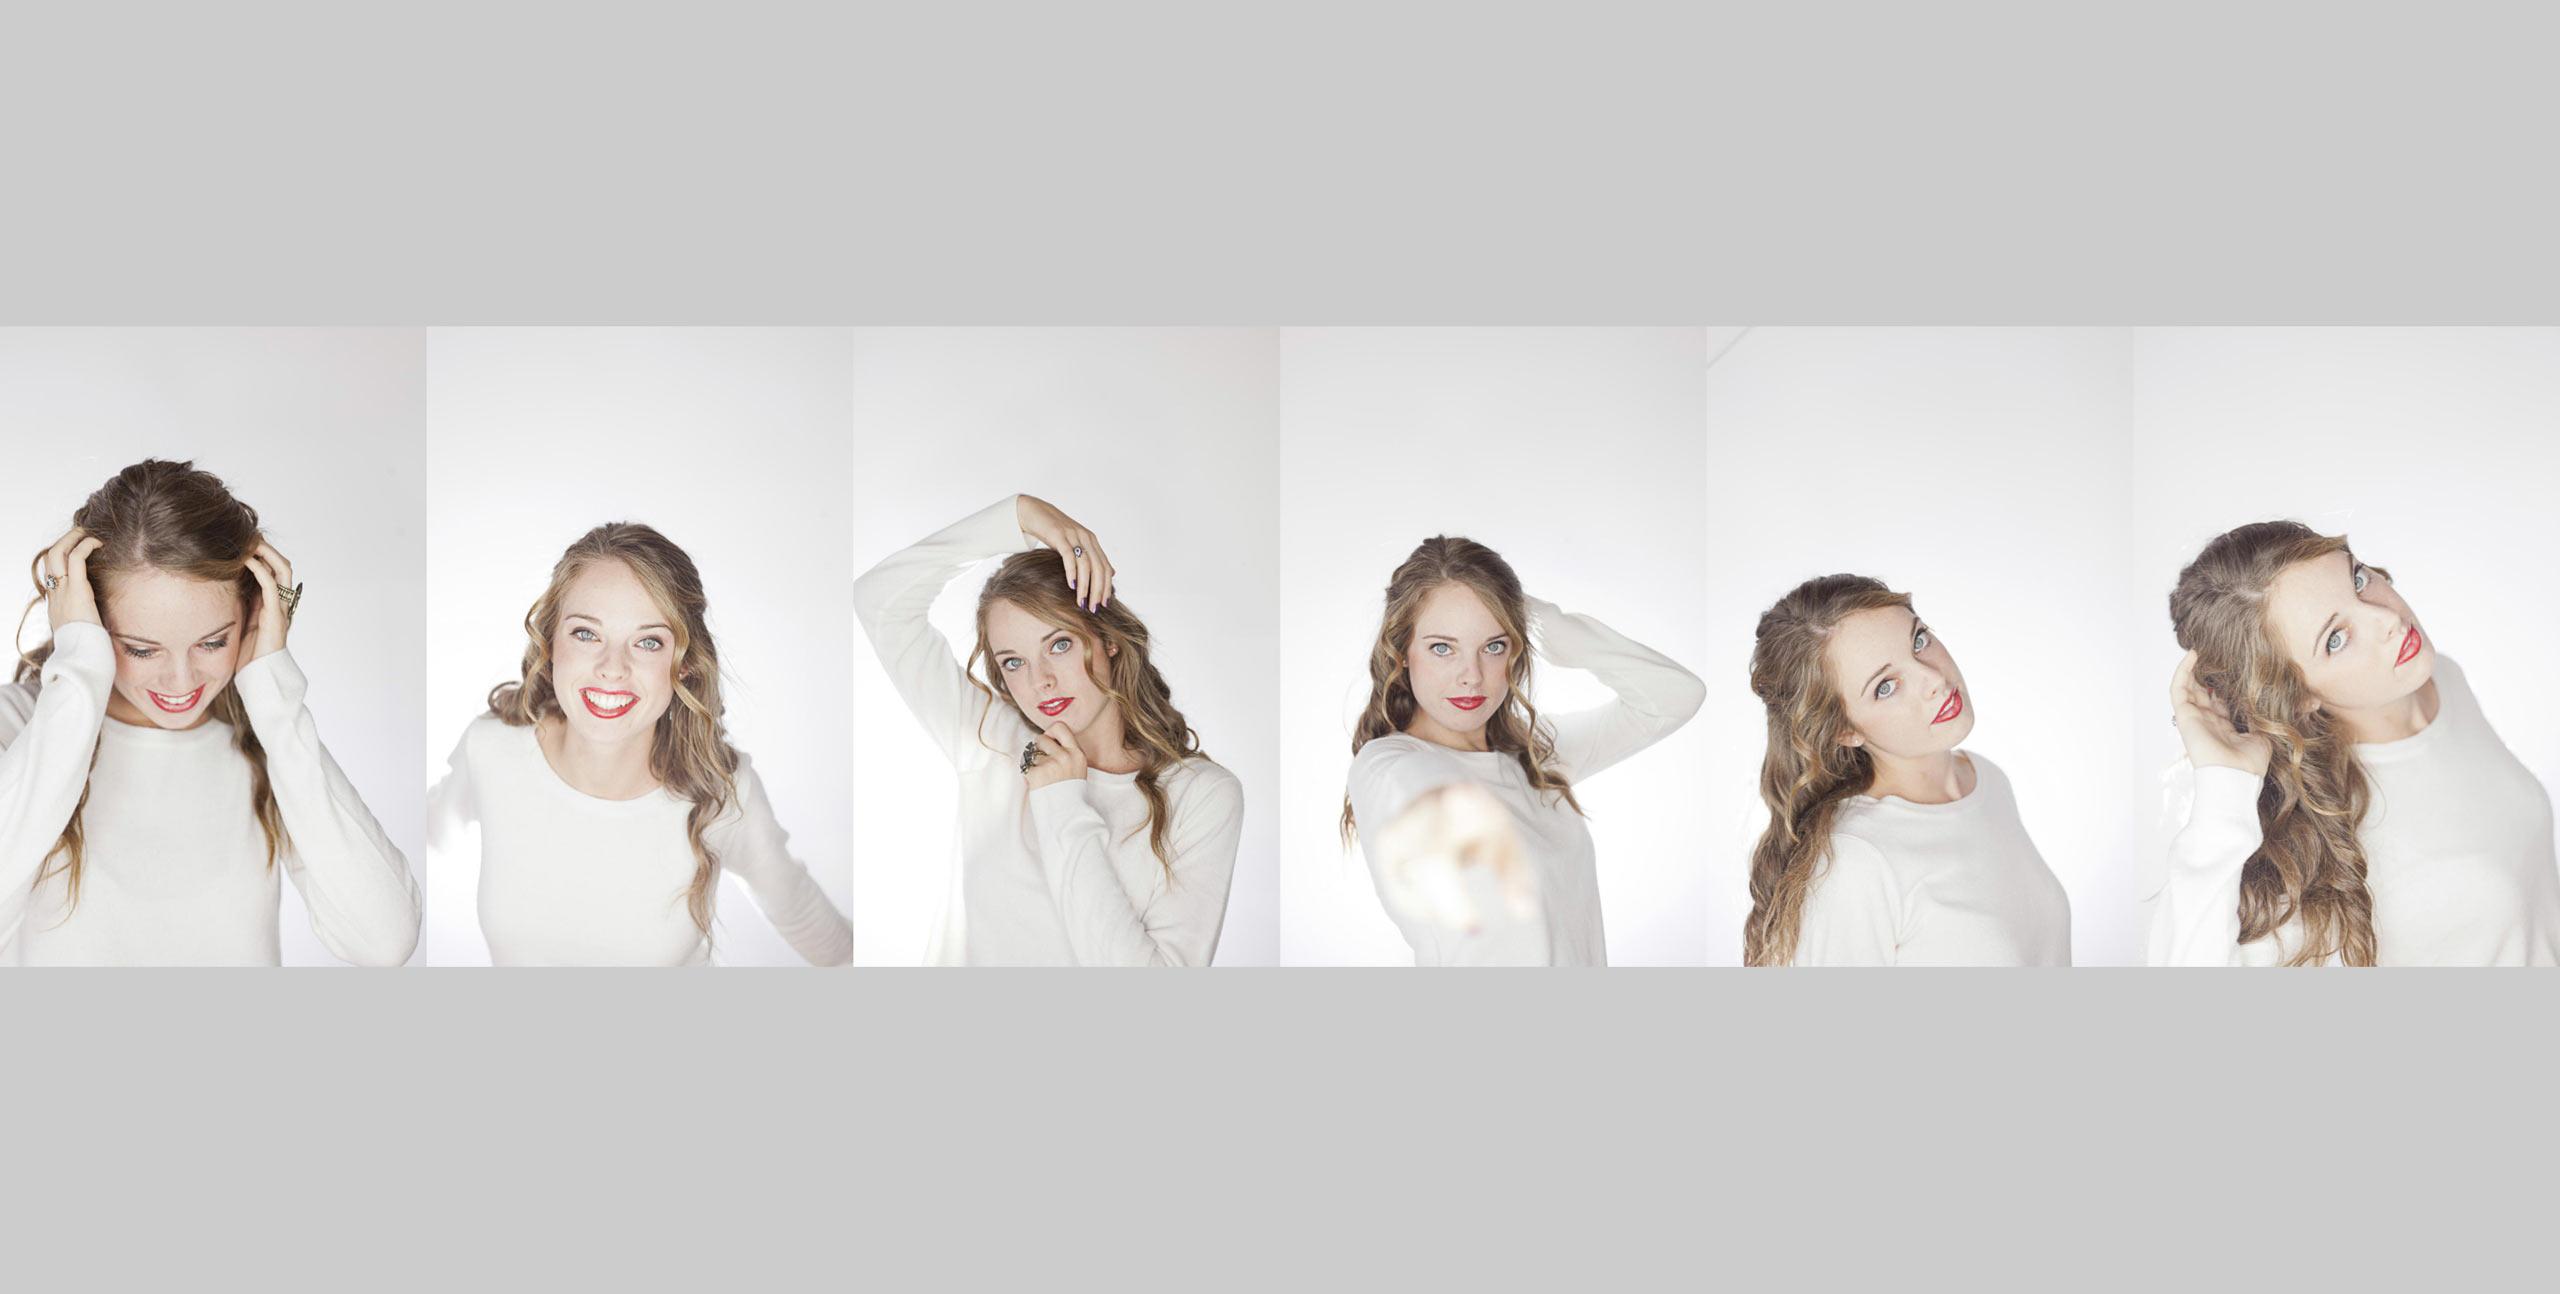 chicago senior portrait photographer claire spreads (15)